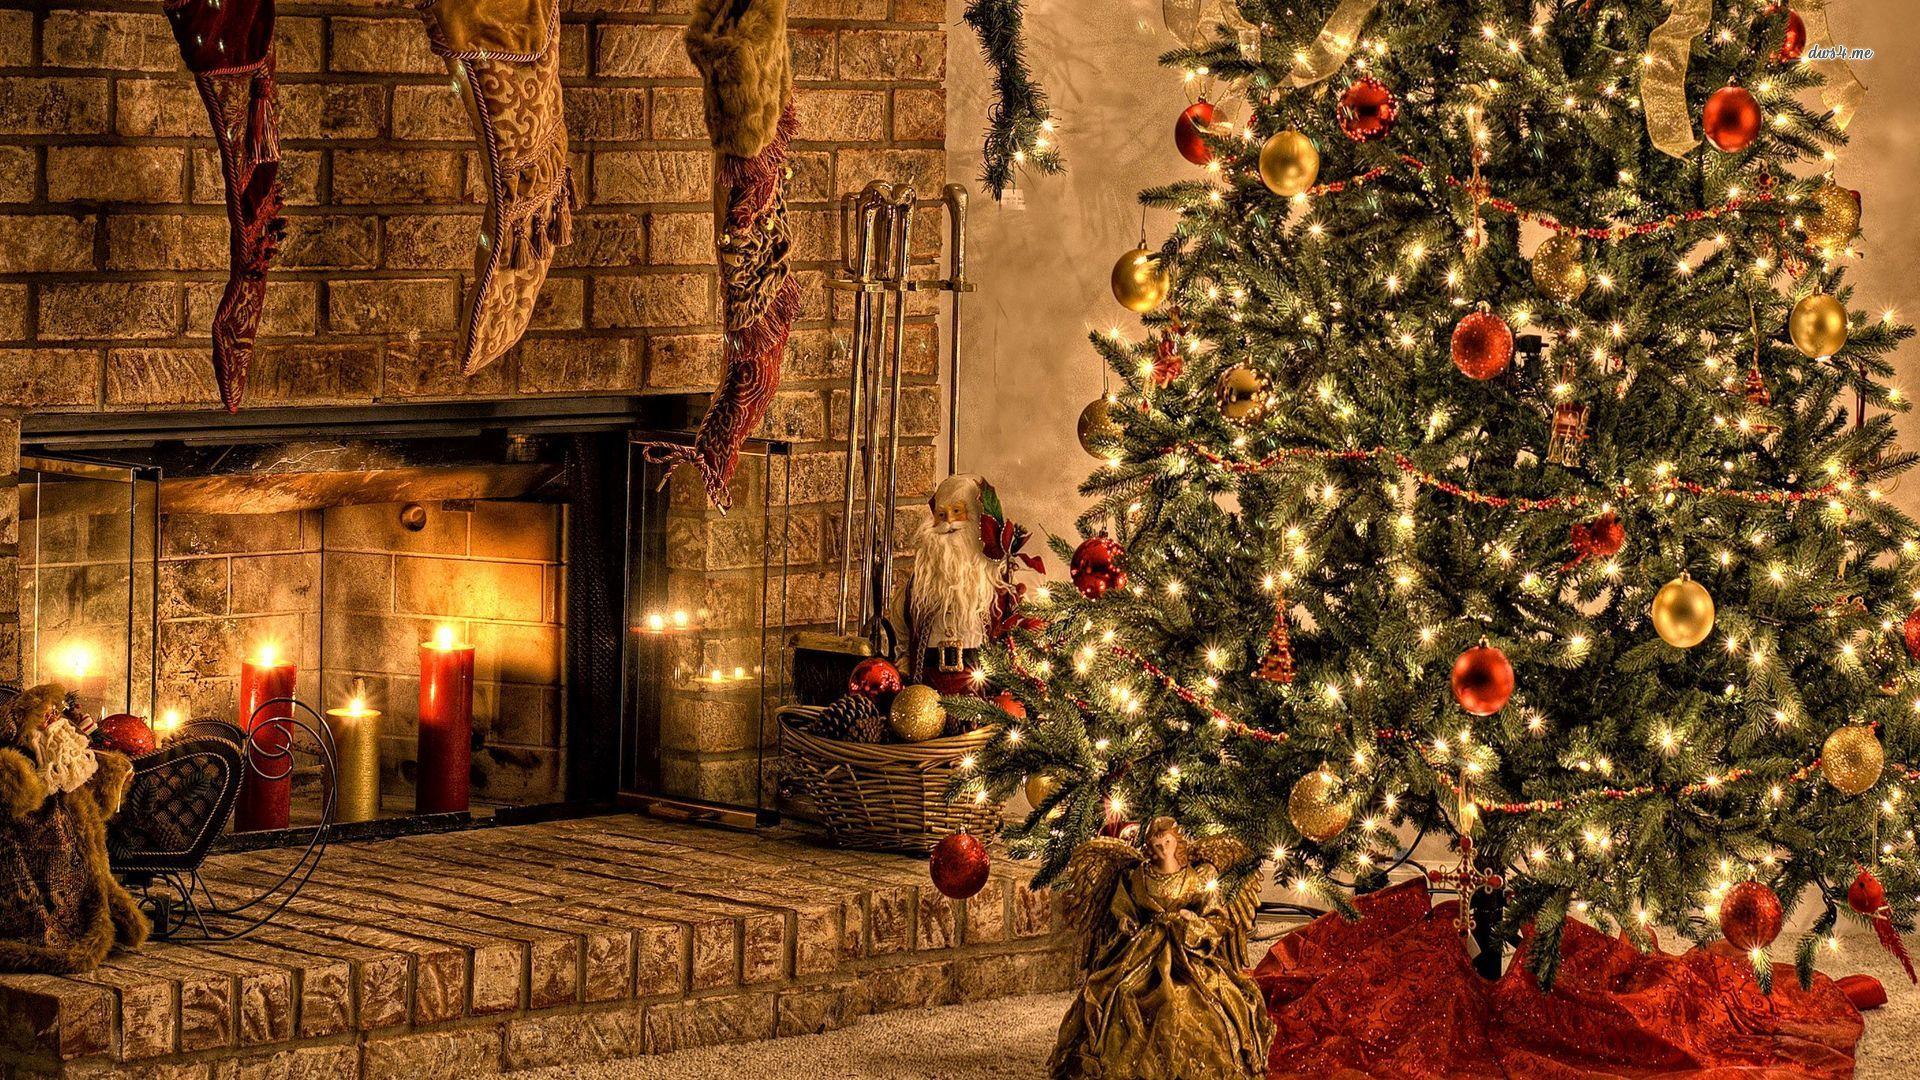 Christmas Fireplace Comfort Download Wallpaper